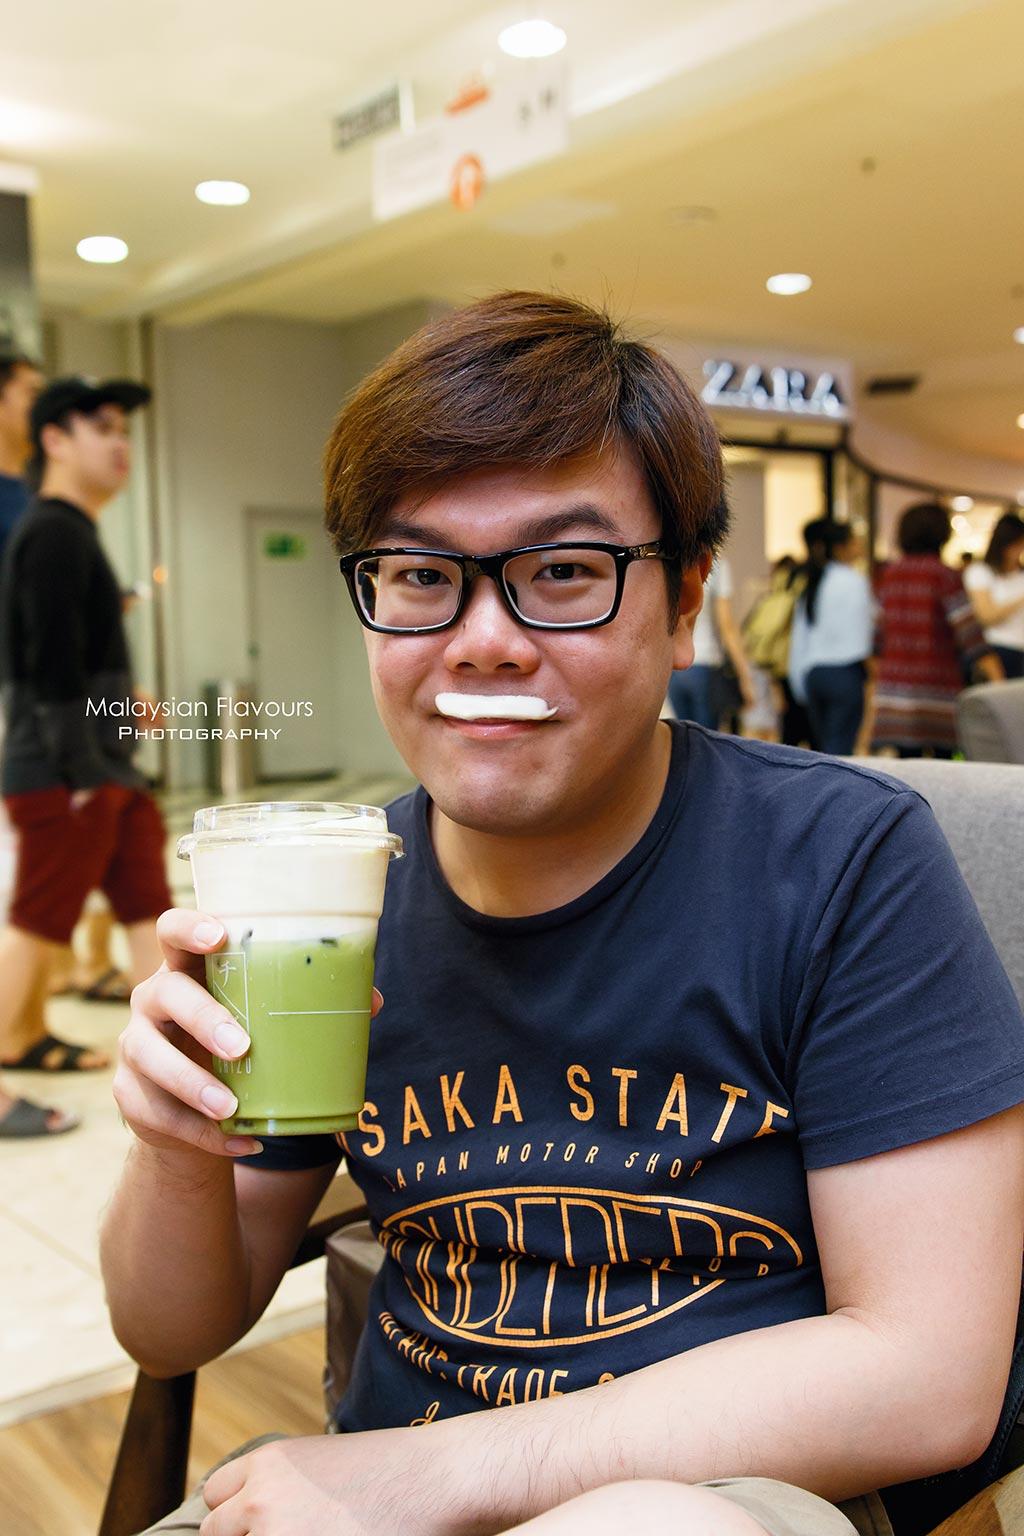 Chizu Drink Sunway Pyramid